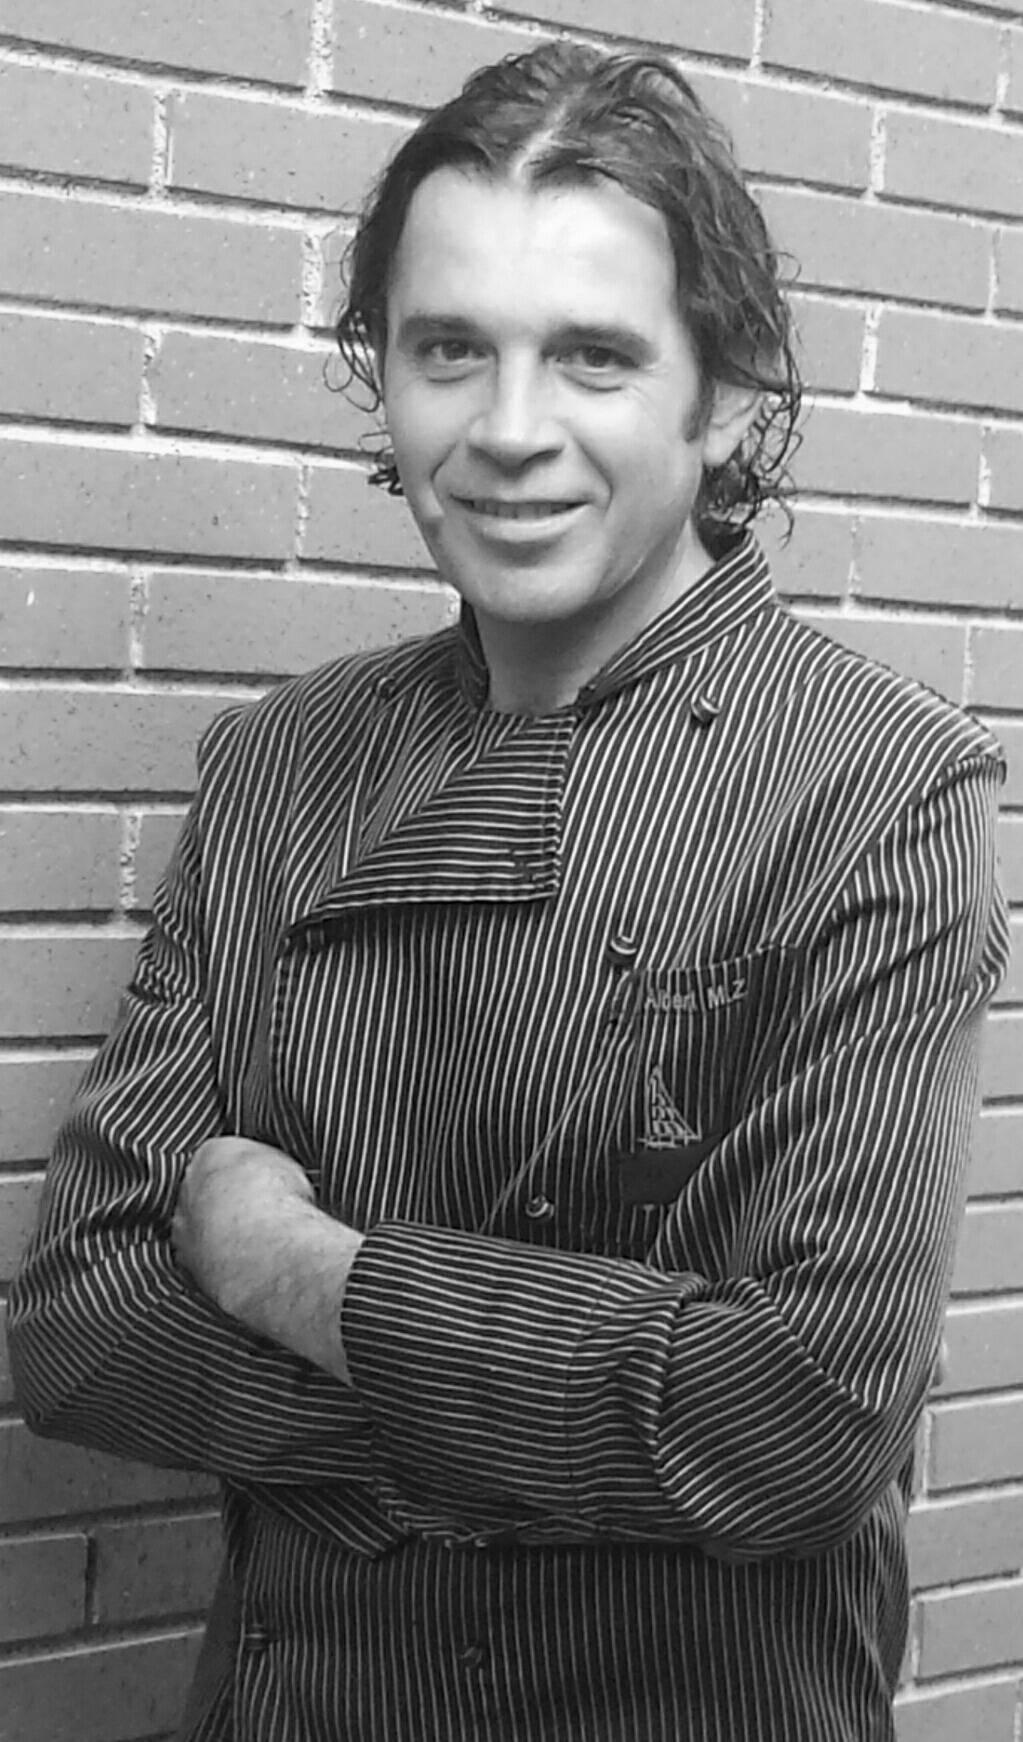 Foto de Albert Márquez Zamora